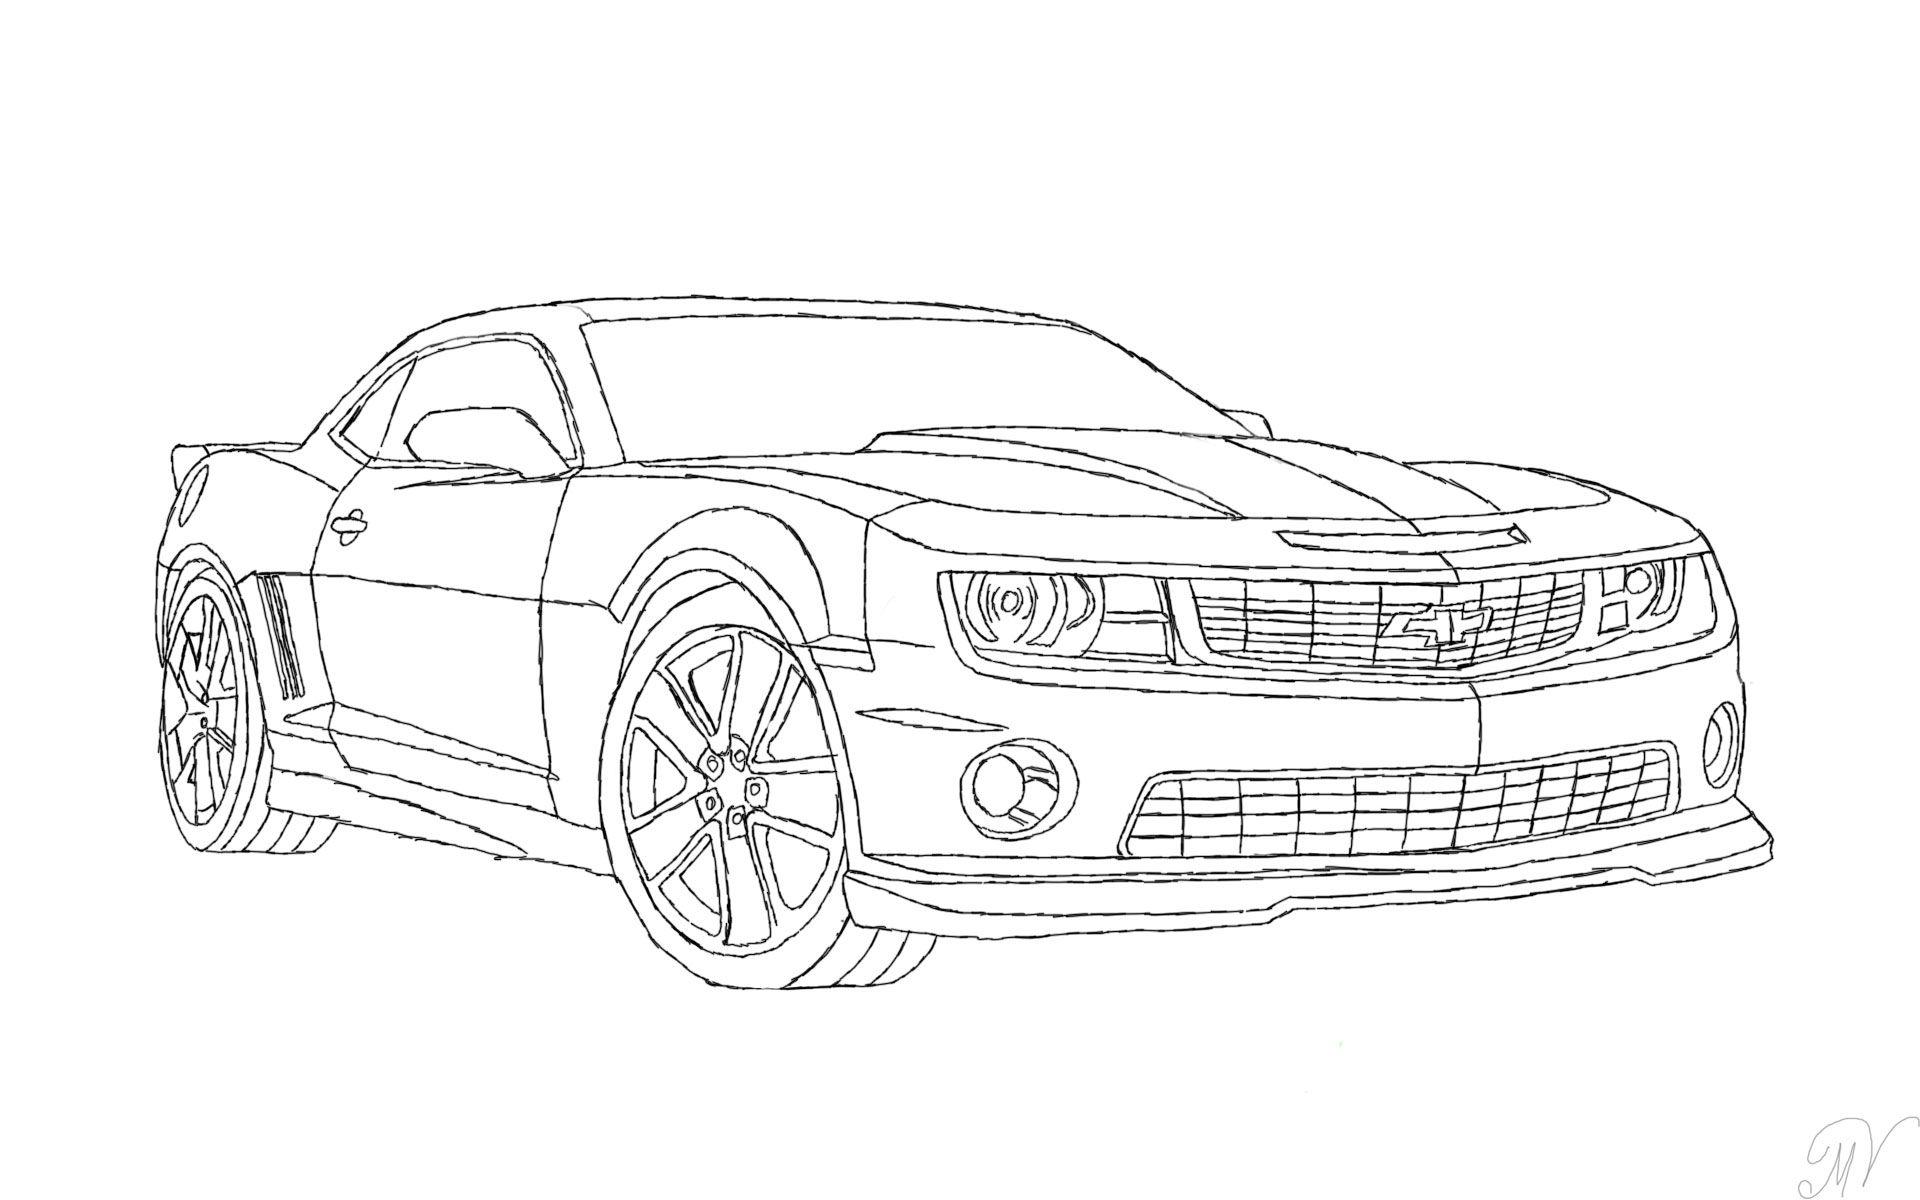 Myndani Ursta A Fyrir Chevrolet Camaro Drawing